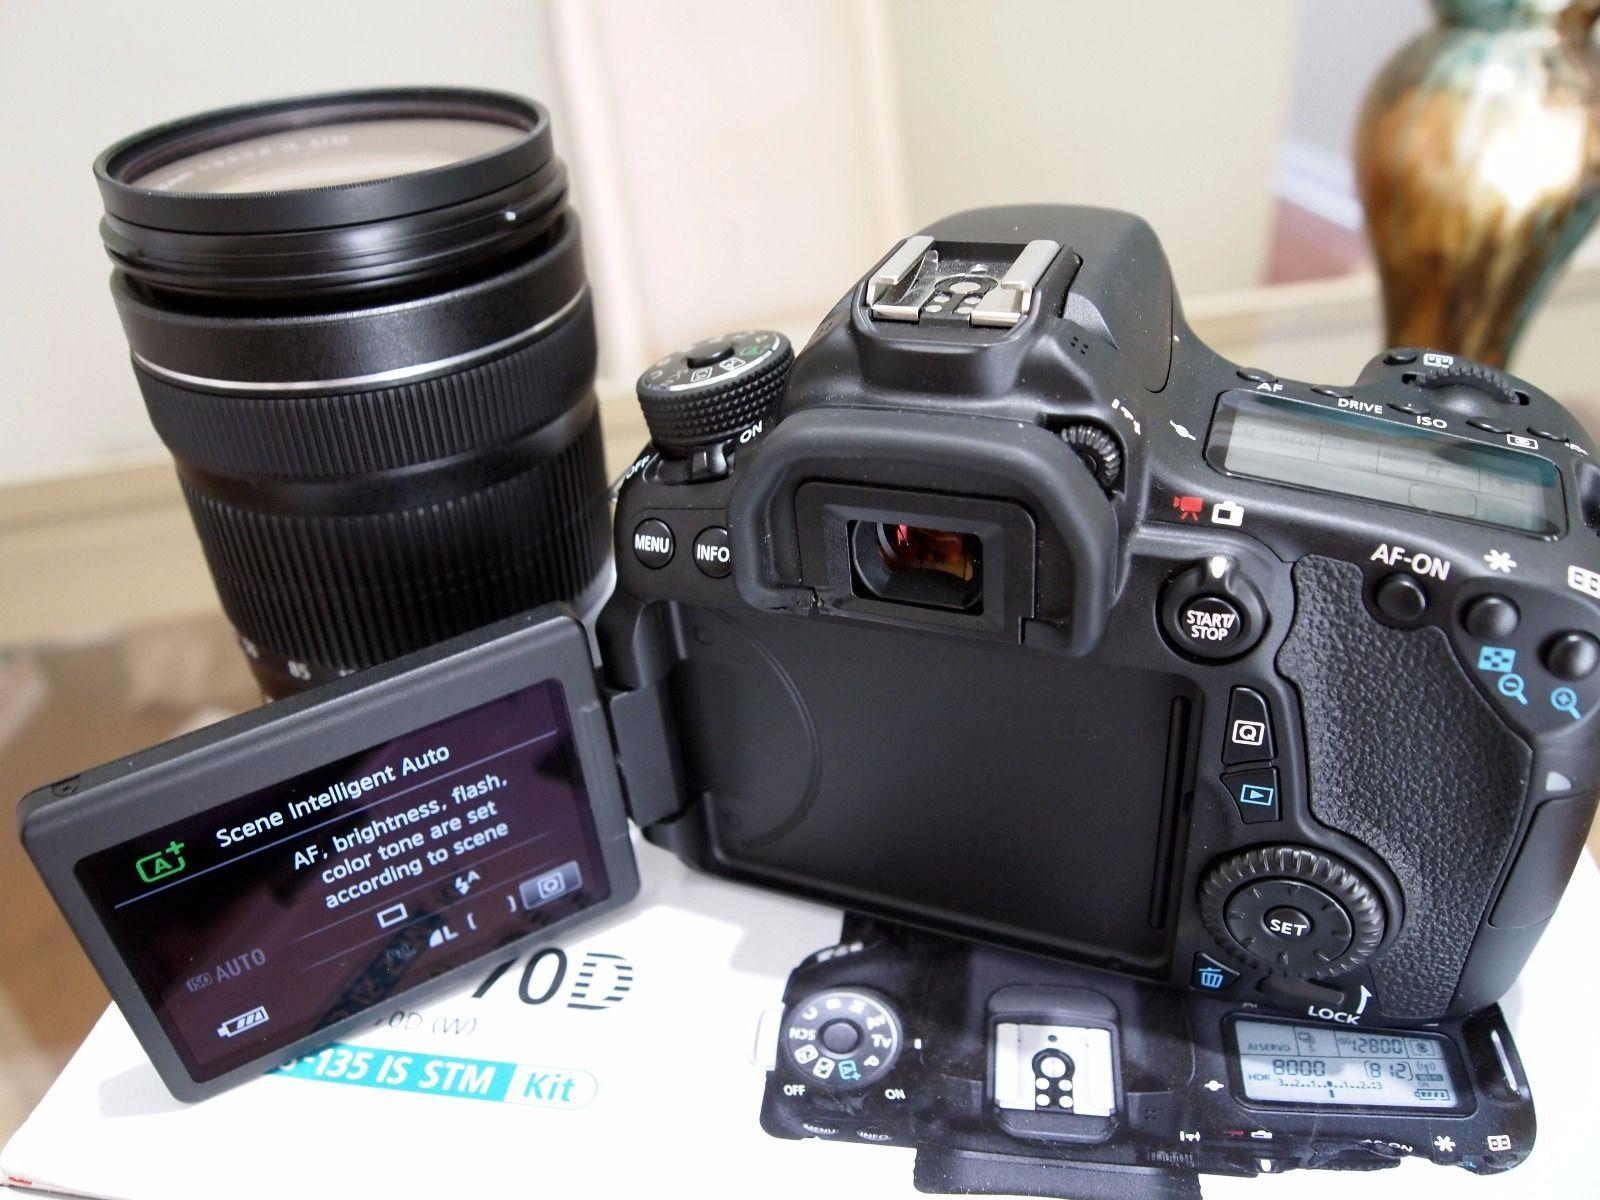 Kelebihan Canon 70d Wifi 18 135 Stm Terkini Daftar Harga Dan Eos Lensa 55 Is Dslr Kit 5